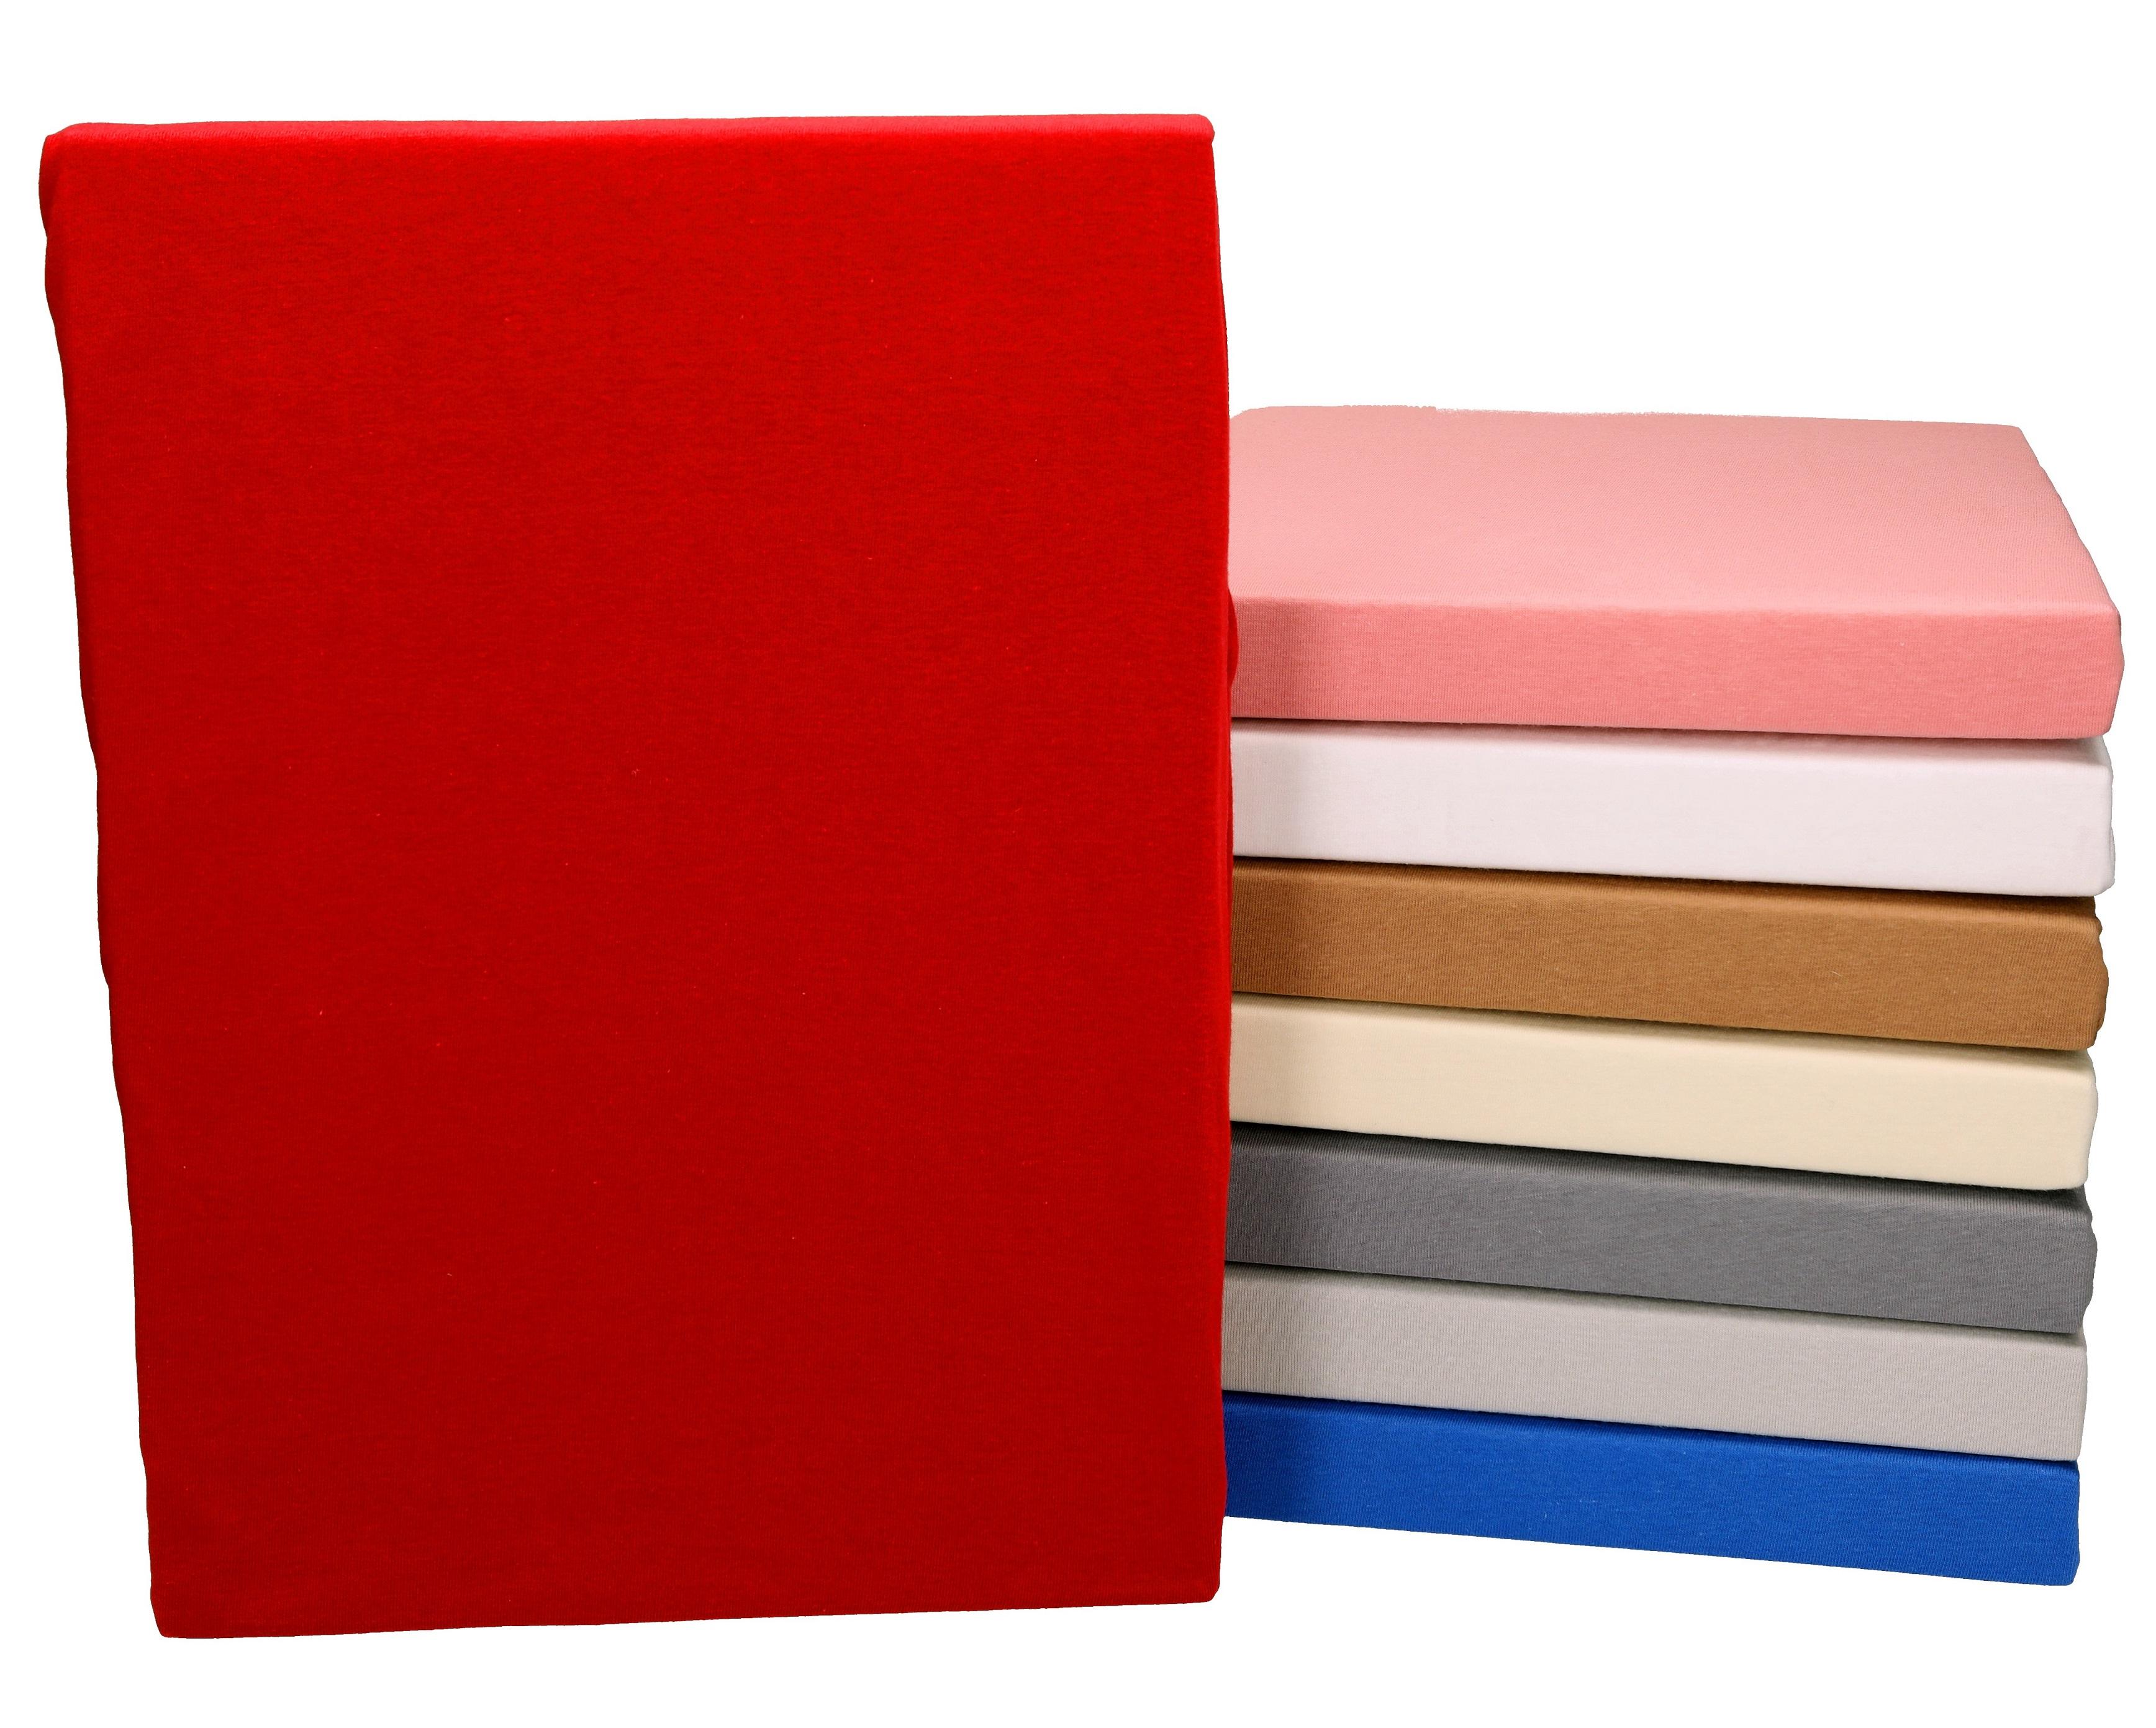 betz spannbetttuch bettlaken 100 mako jersey gr e ca 100x200 cm in verschiedene farben. Black Bedroom Furniture Sets. Home Design Ideas